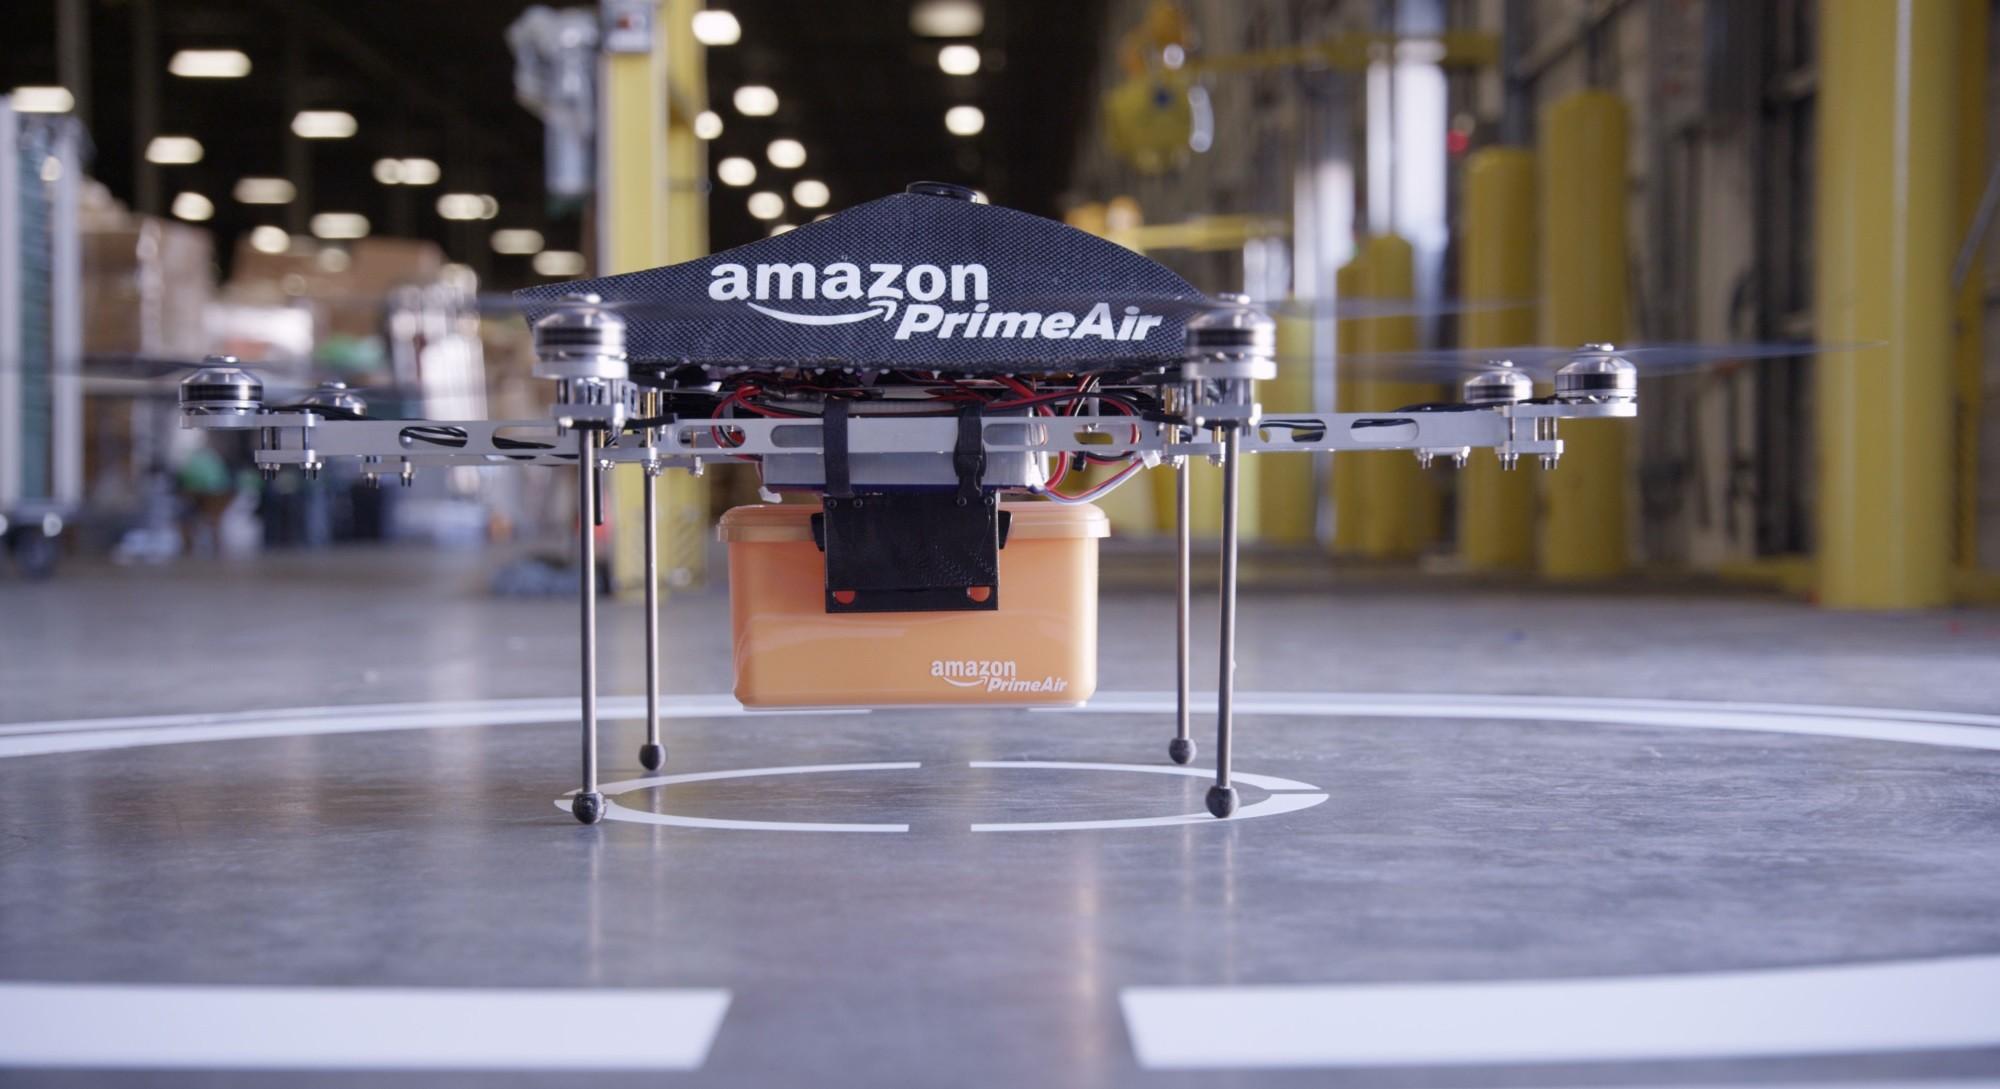 Prime Air 無人機。圖片來源:亞馬遜